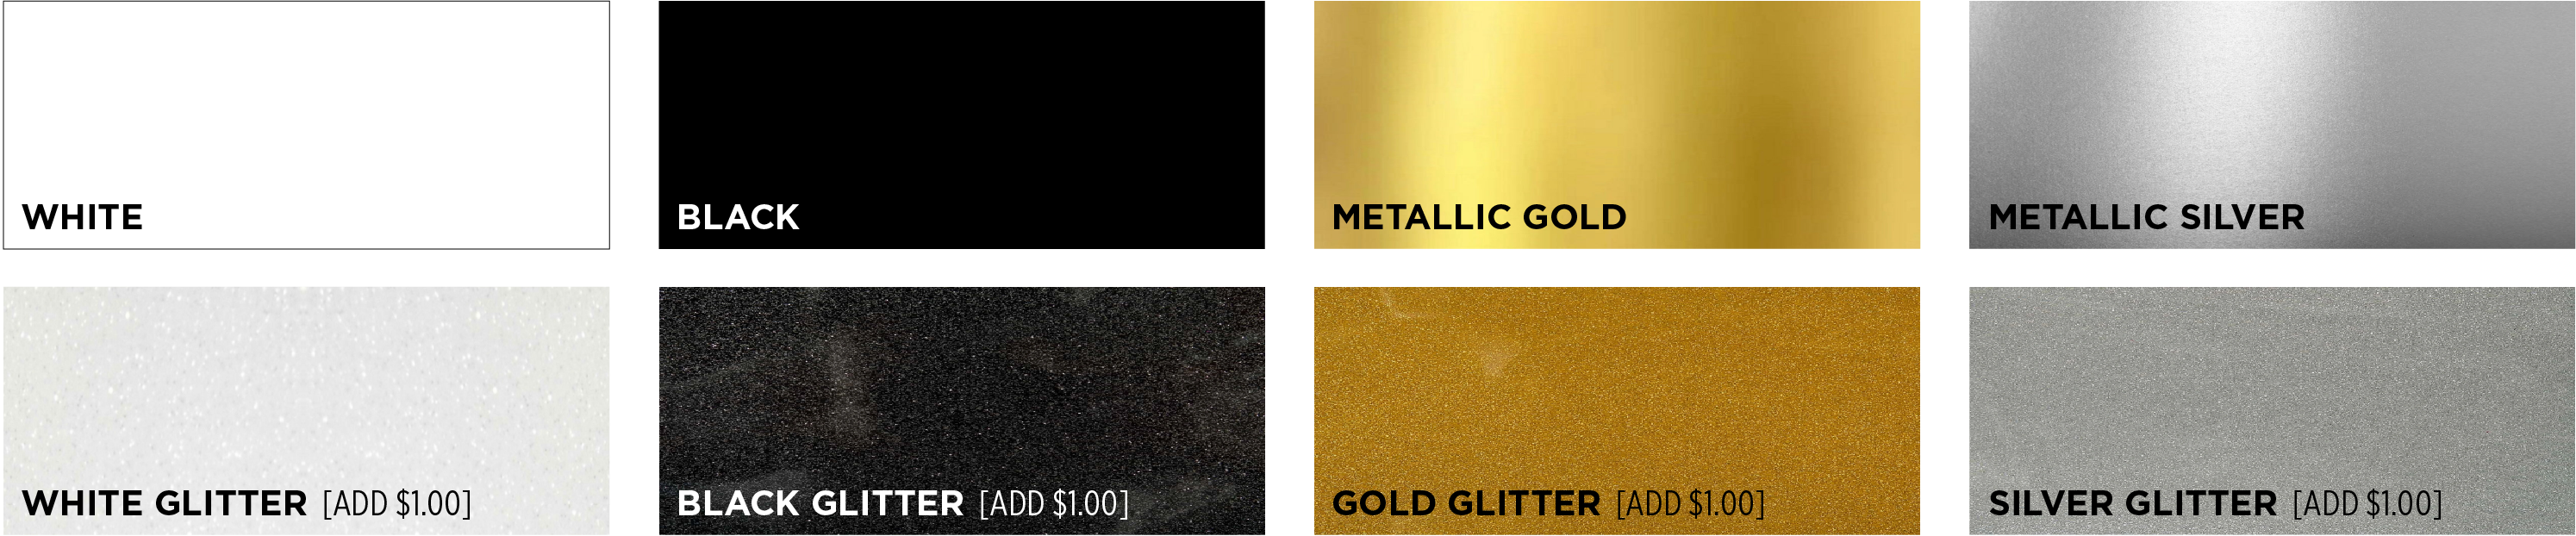 Color options: White, Black, Metallic Gold, Metallic Silver, Glitter White add $1.00, Glitter Black add $1.00, Glitter Gold add $1.00, Glitter Silver add $1.00.